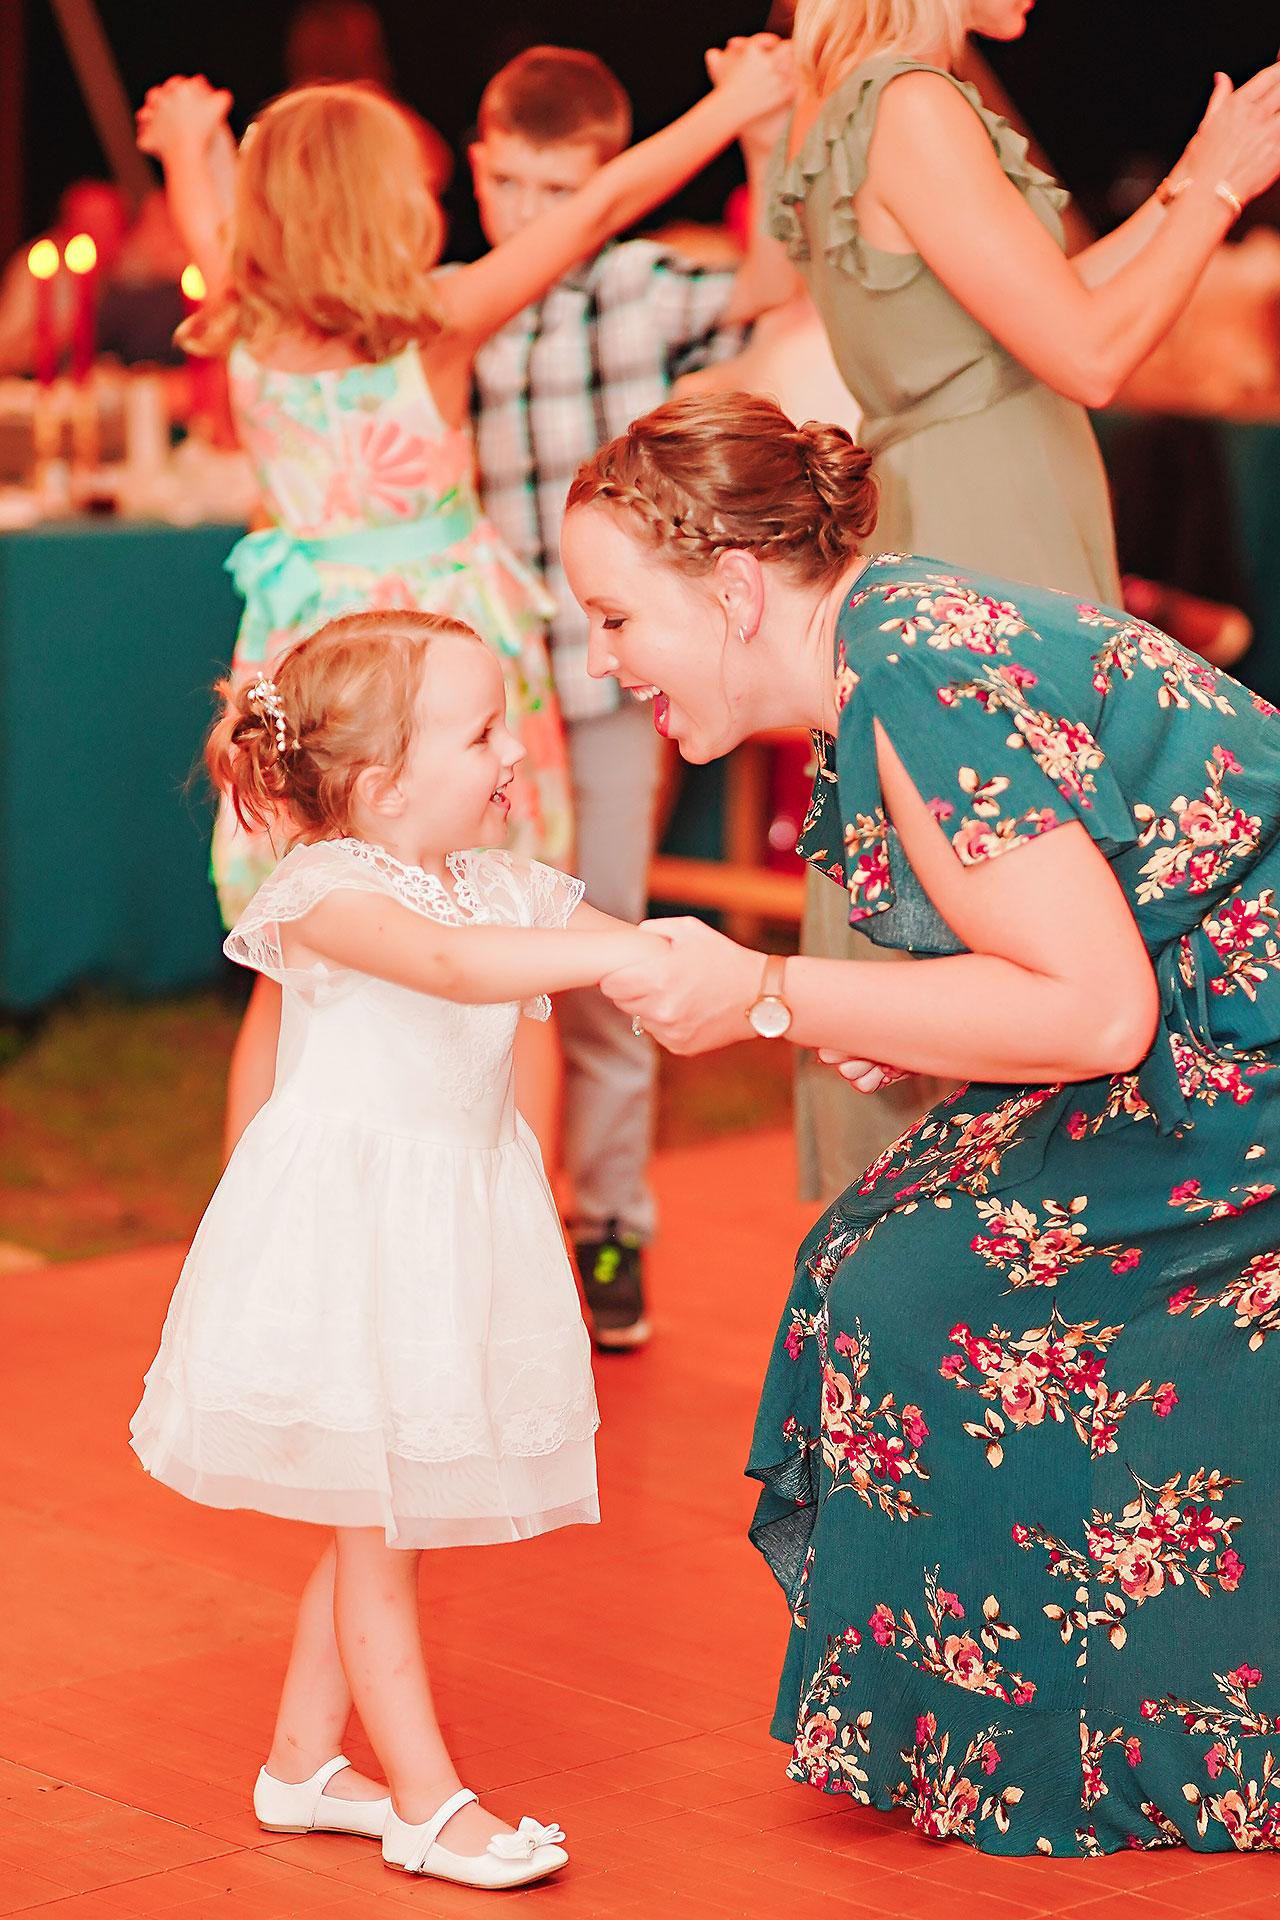 Hannah Ian Friendship Gardens Michigan City Indiana Wedding 354